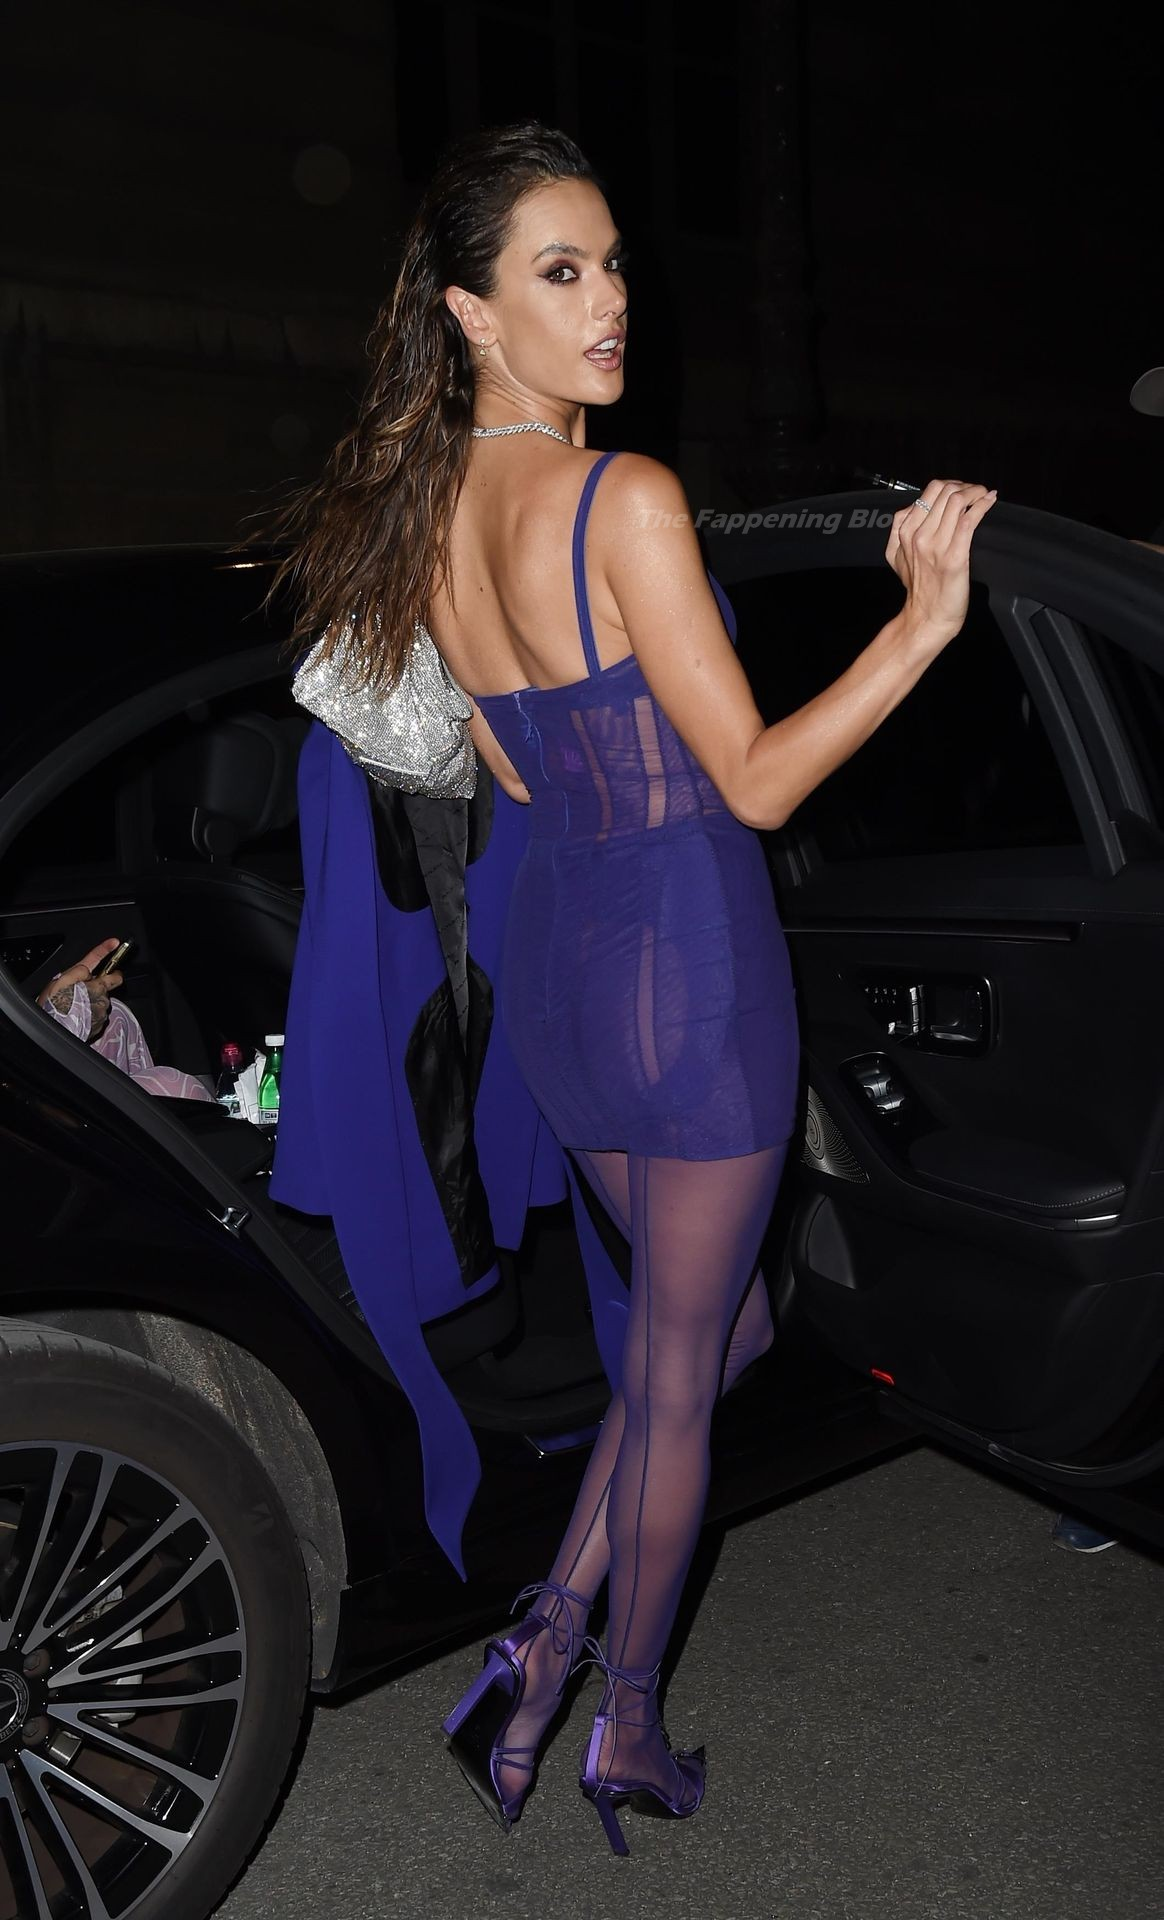 Alessandra-Ambrosio-Sexy-The-Fappening-Blog-29-2.jpg